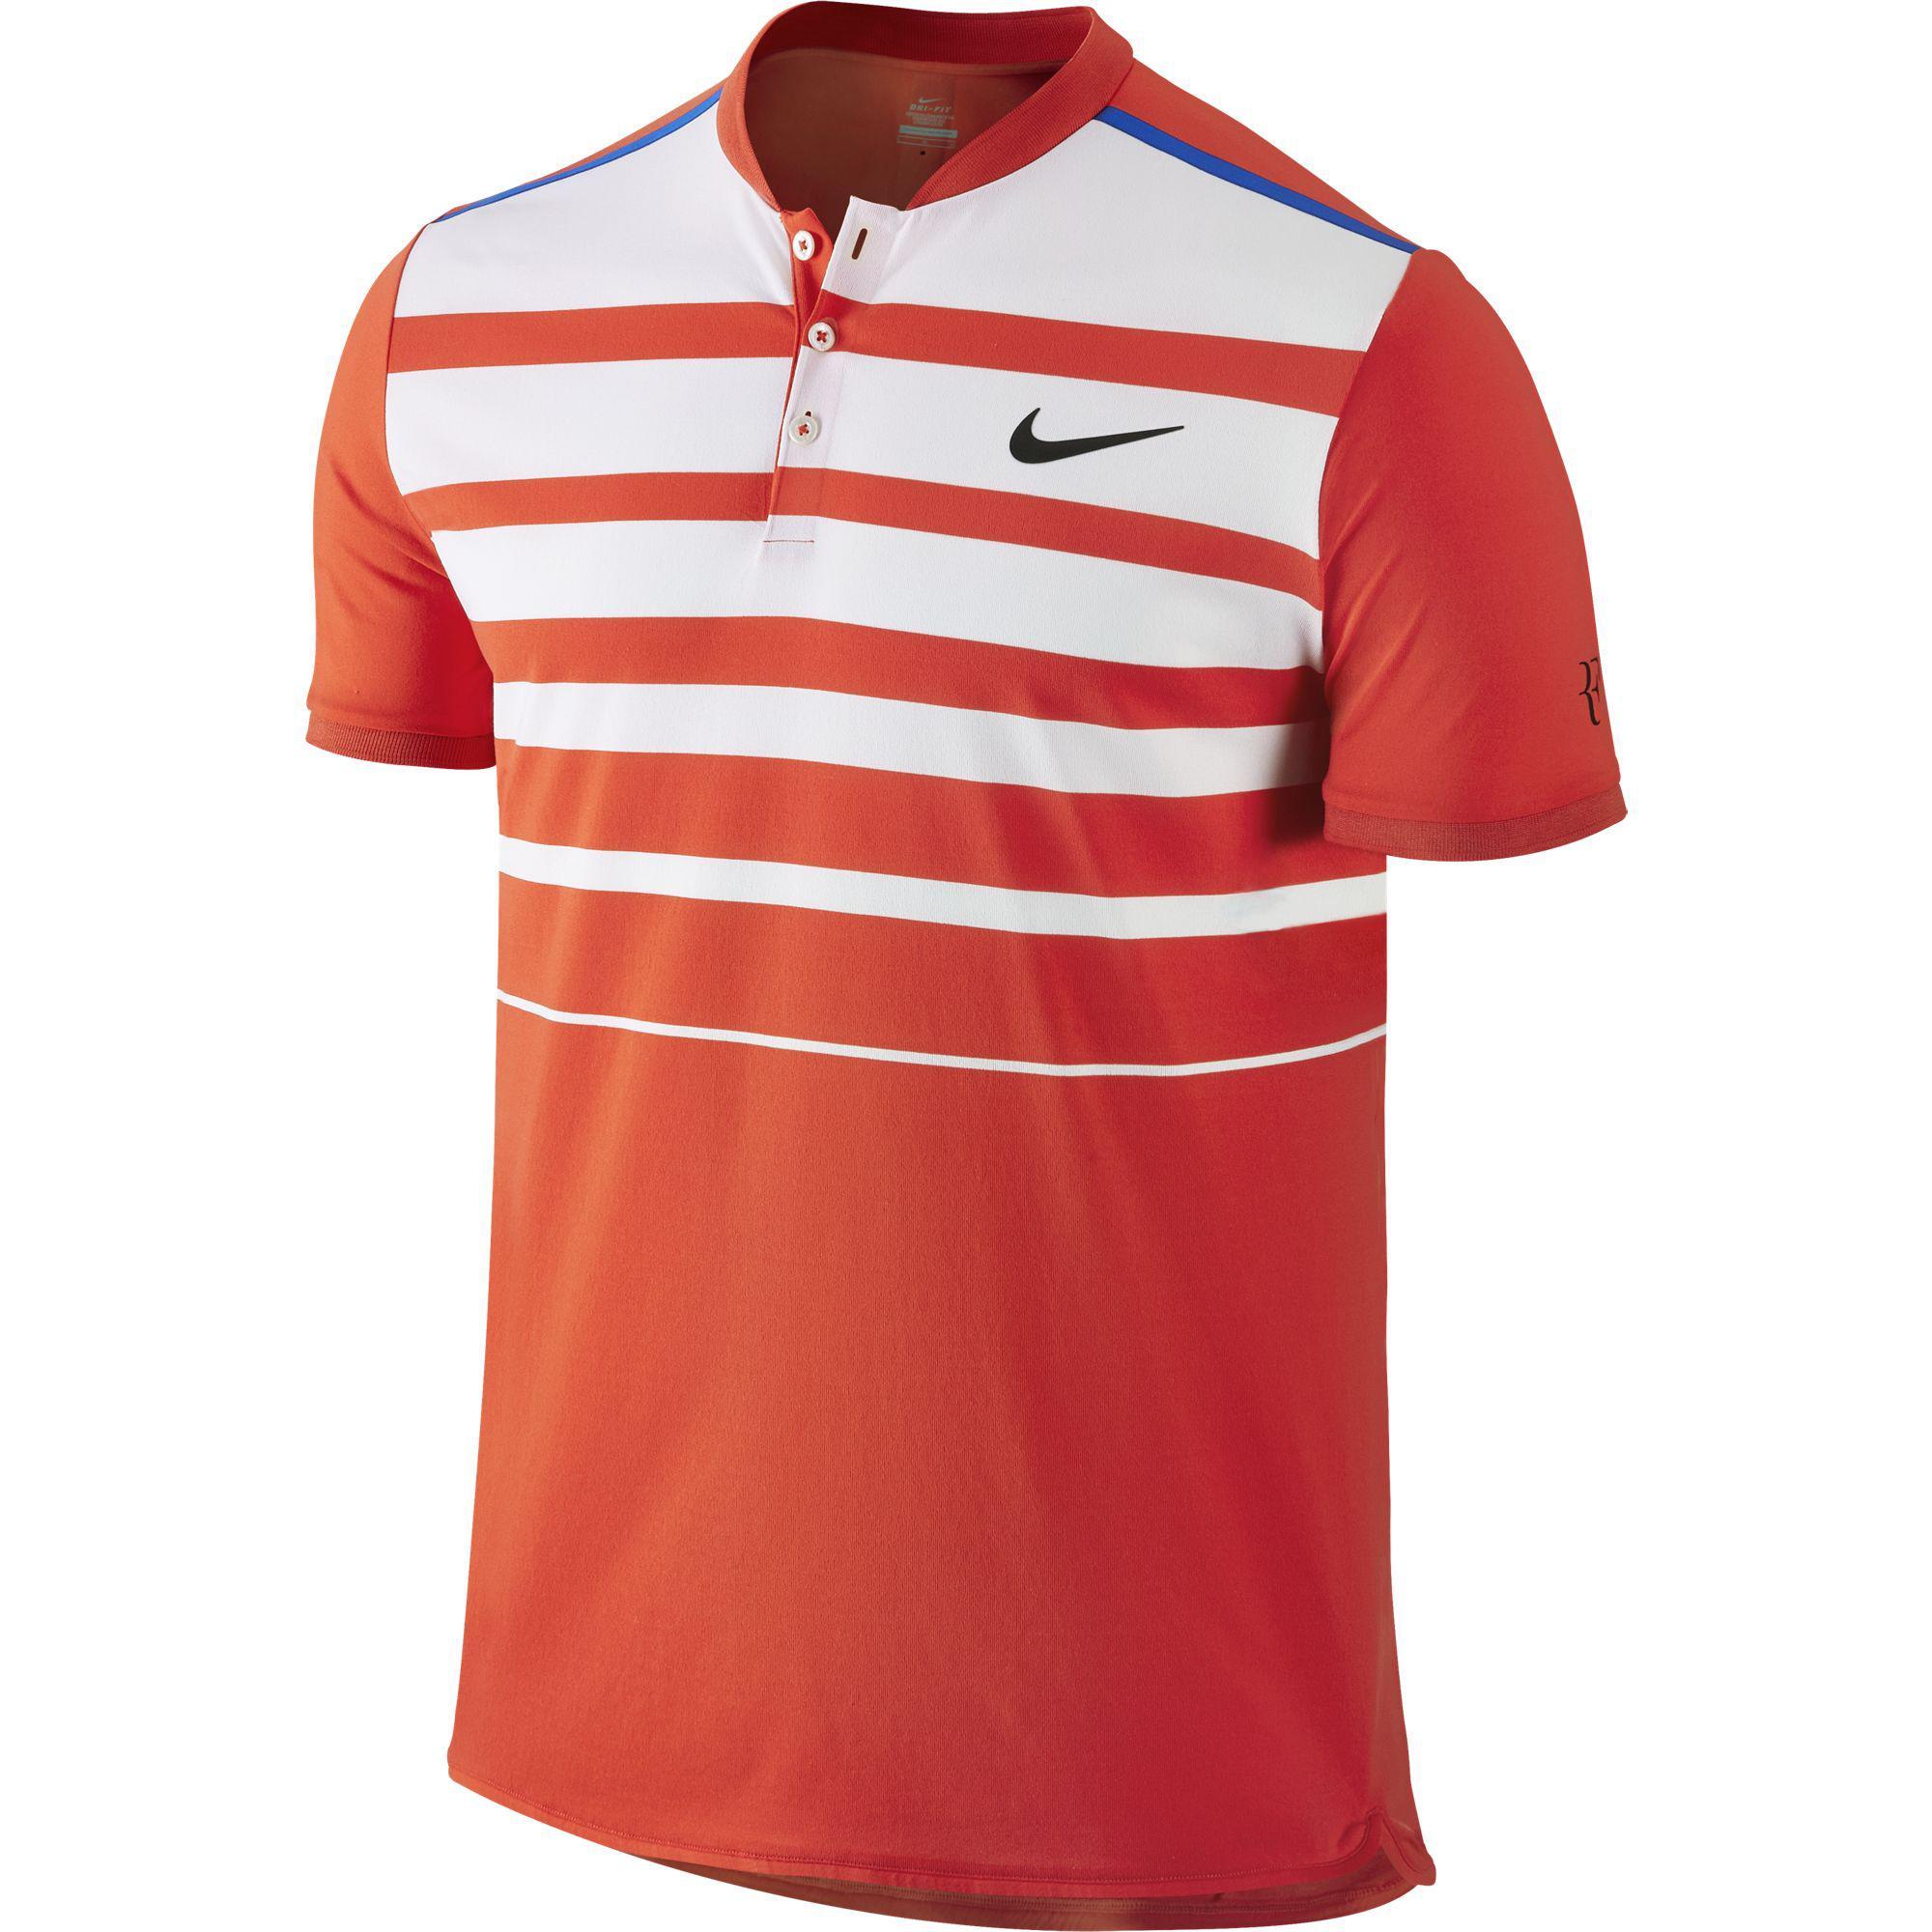 Nike Mens Premier RF Polo - Light Crimson Photo Blue - Tennisnuts.com 4e00423a8ed4